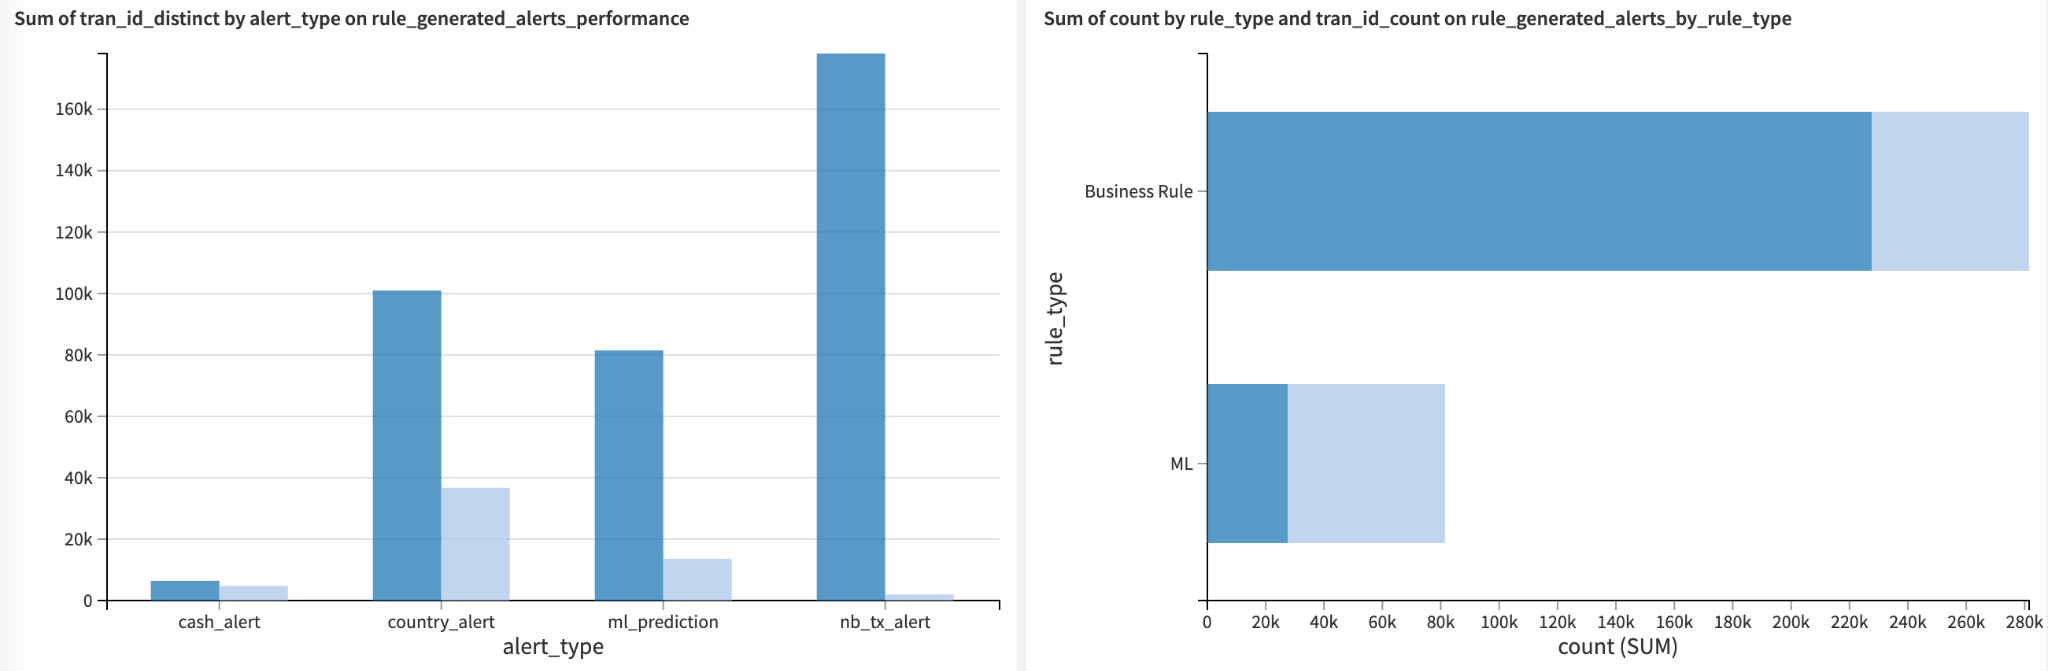 Dataiku dashboard comparing rules-based and ML-based alerts